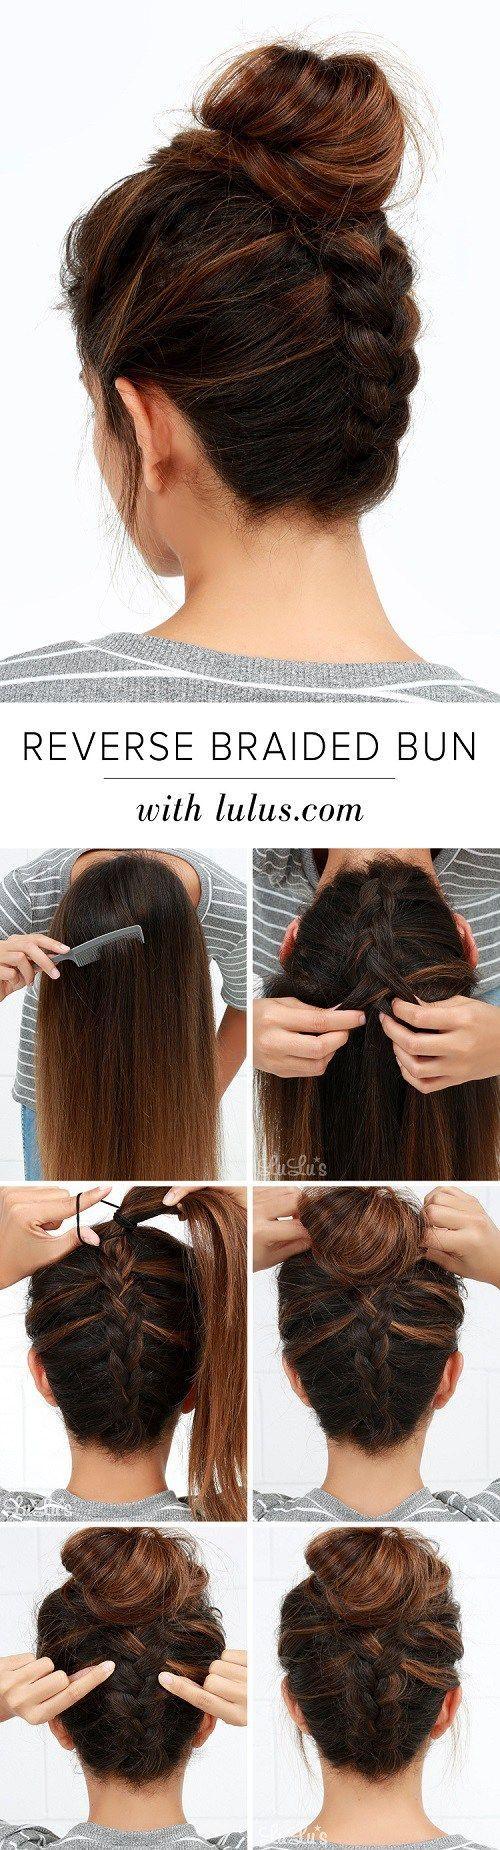 17 hair tutorials you can totally diy bun tutorials tutorials 17 hair tutorials you can totally diy baditri Choice Image